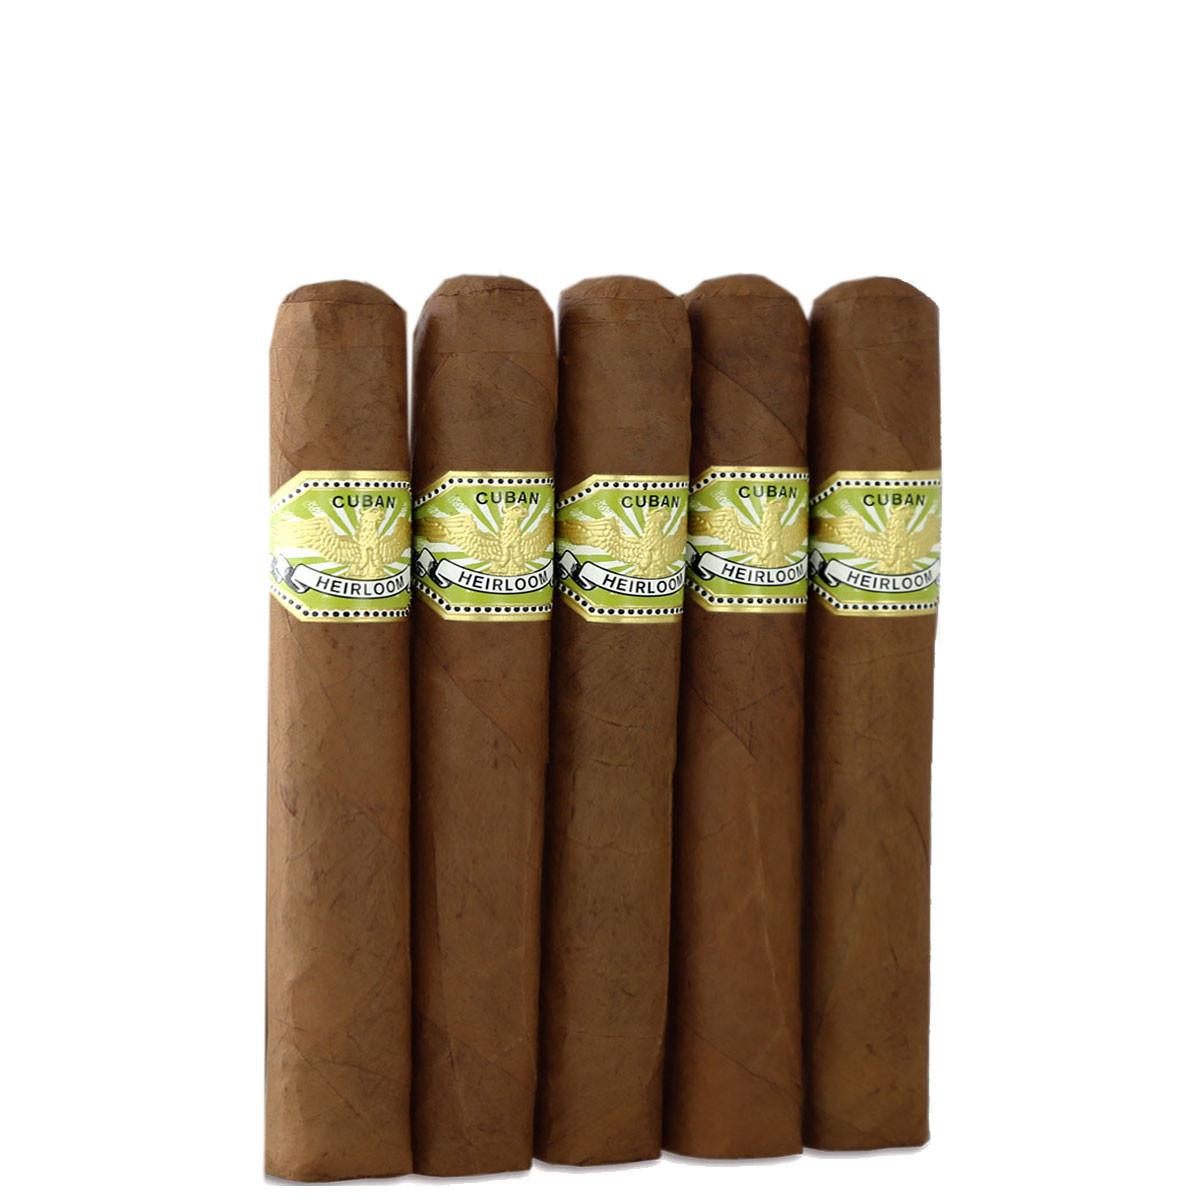 Cuban Heirloom Cameroon 556 Reserve (5.25x56 / 5 Pack)